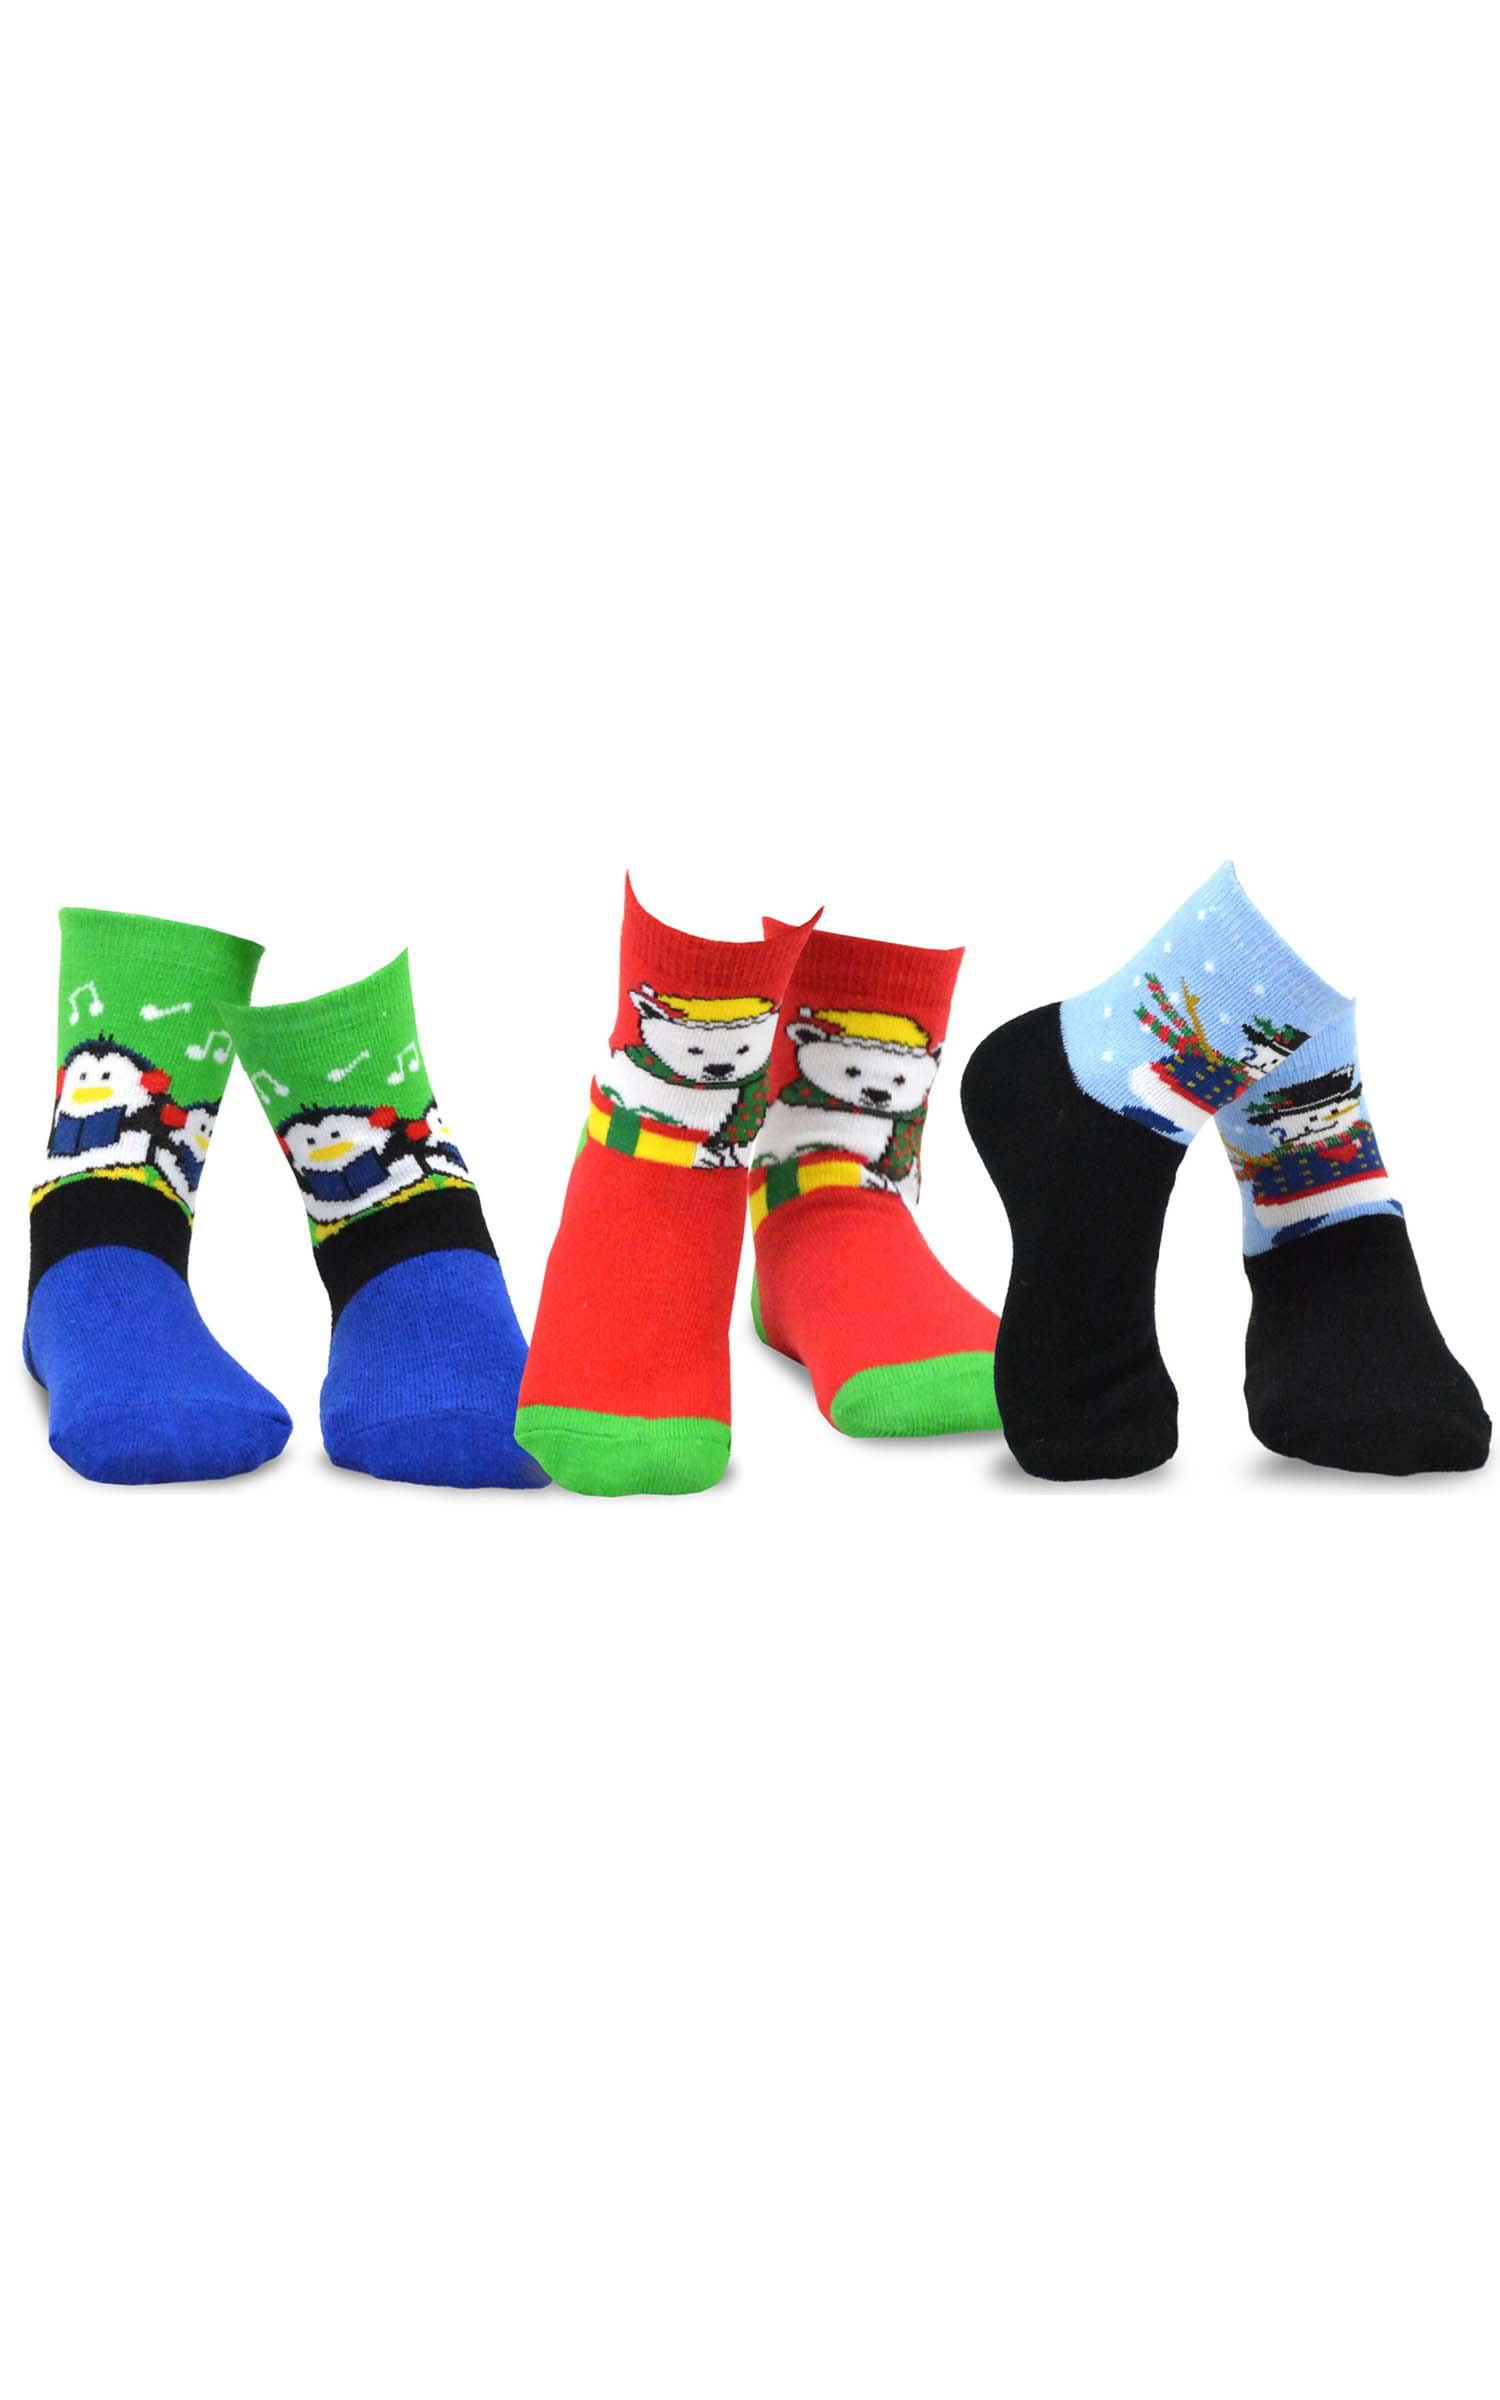 aa2648a442f TeeHee Kids - TeeHee Christmas Kids Cotton Fun Crew Socks 3-Pair Pack -  Walmart.com